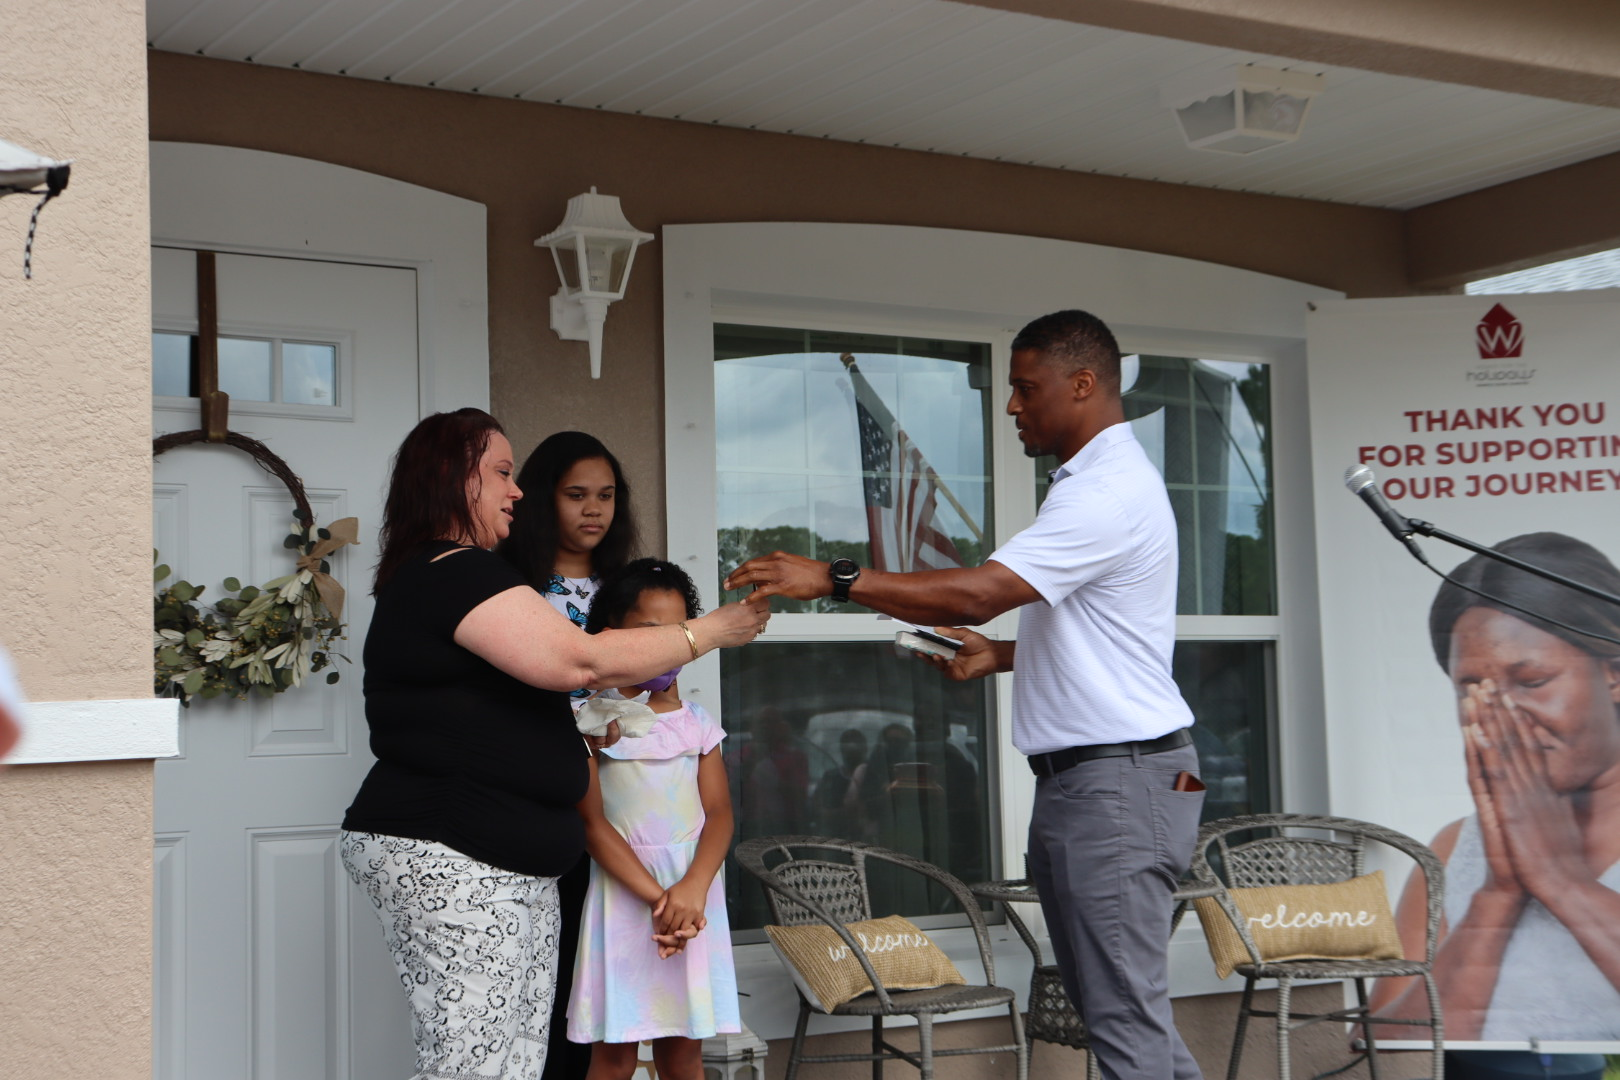 Warrick Dunn, MarineMax Make Homeownership Dreams Come True